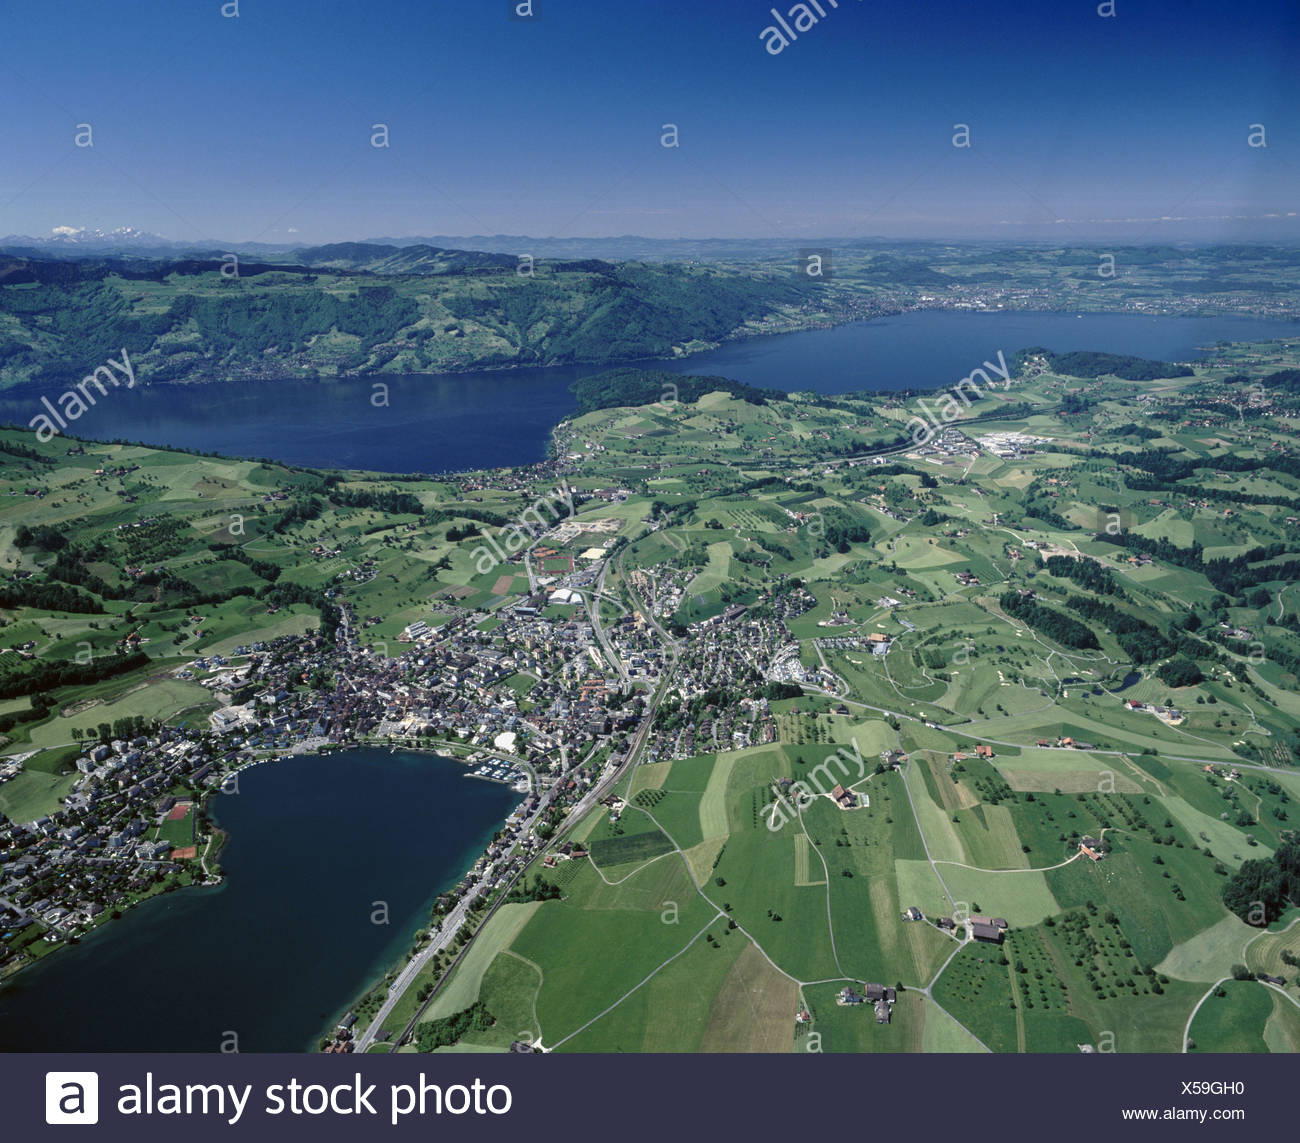 line of sight Zurich cartographic Kussnacht am Rigi aerial photo aerial view scenery Switzerland Europe Swi - Stock Image